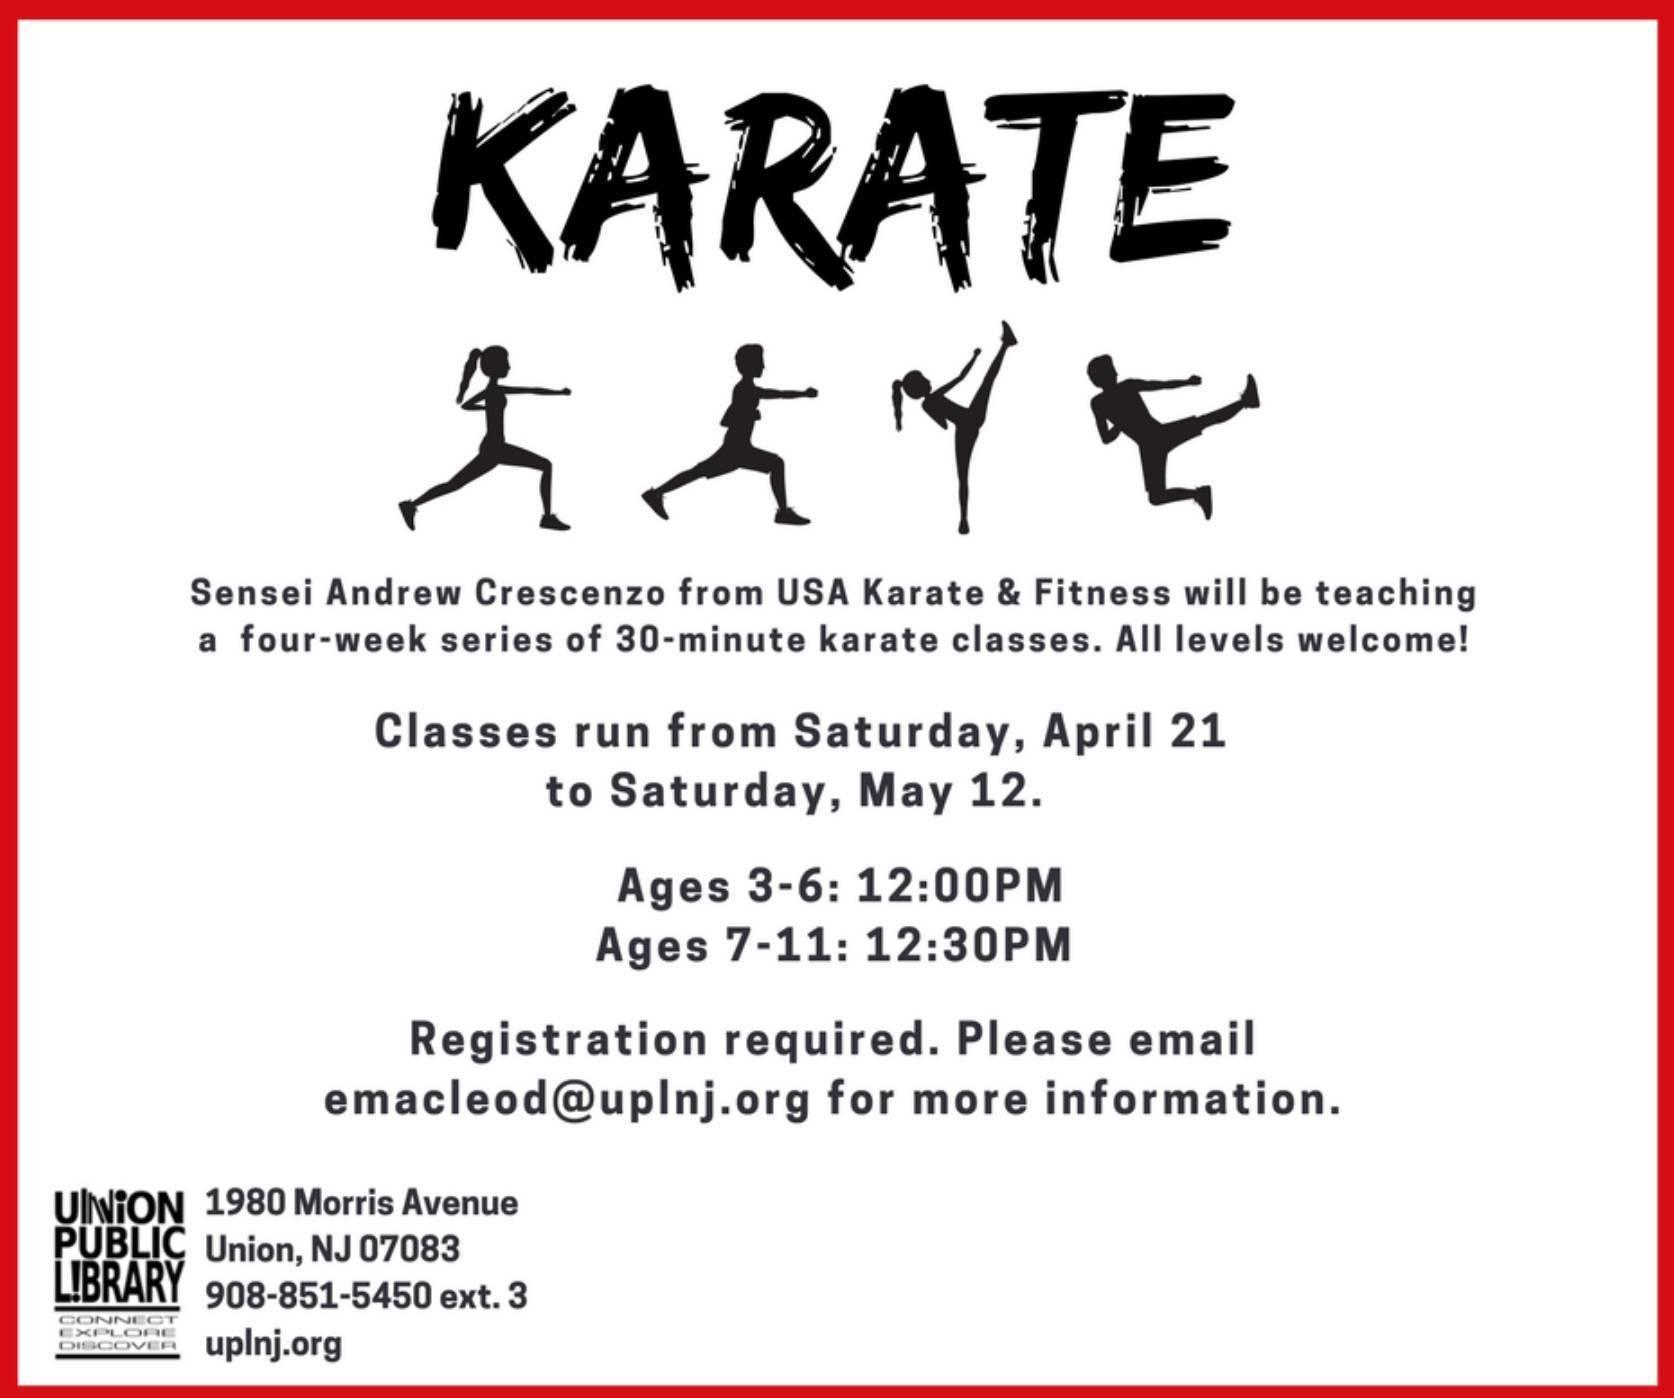 df92847ccb217a89e105_37dc0cfbb68b98c1a40c_karate_at_library.jpg